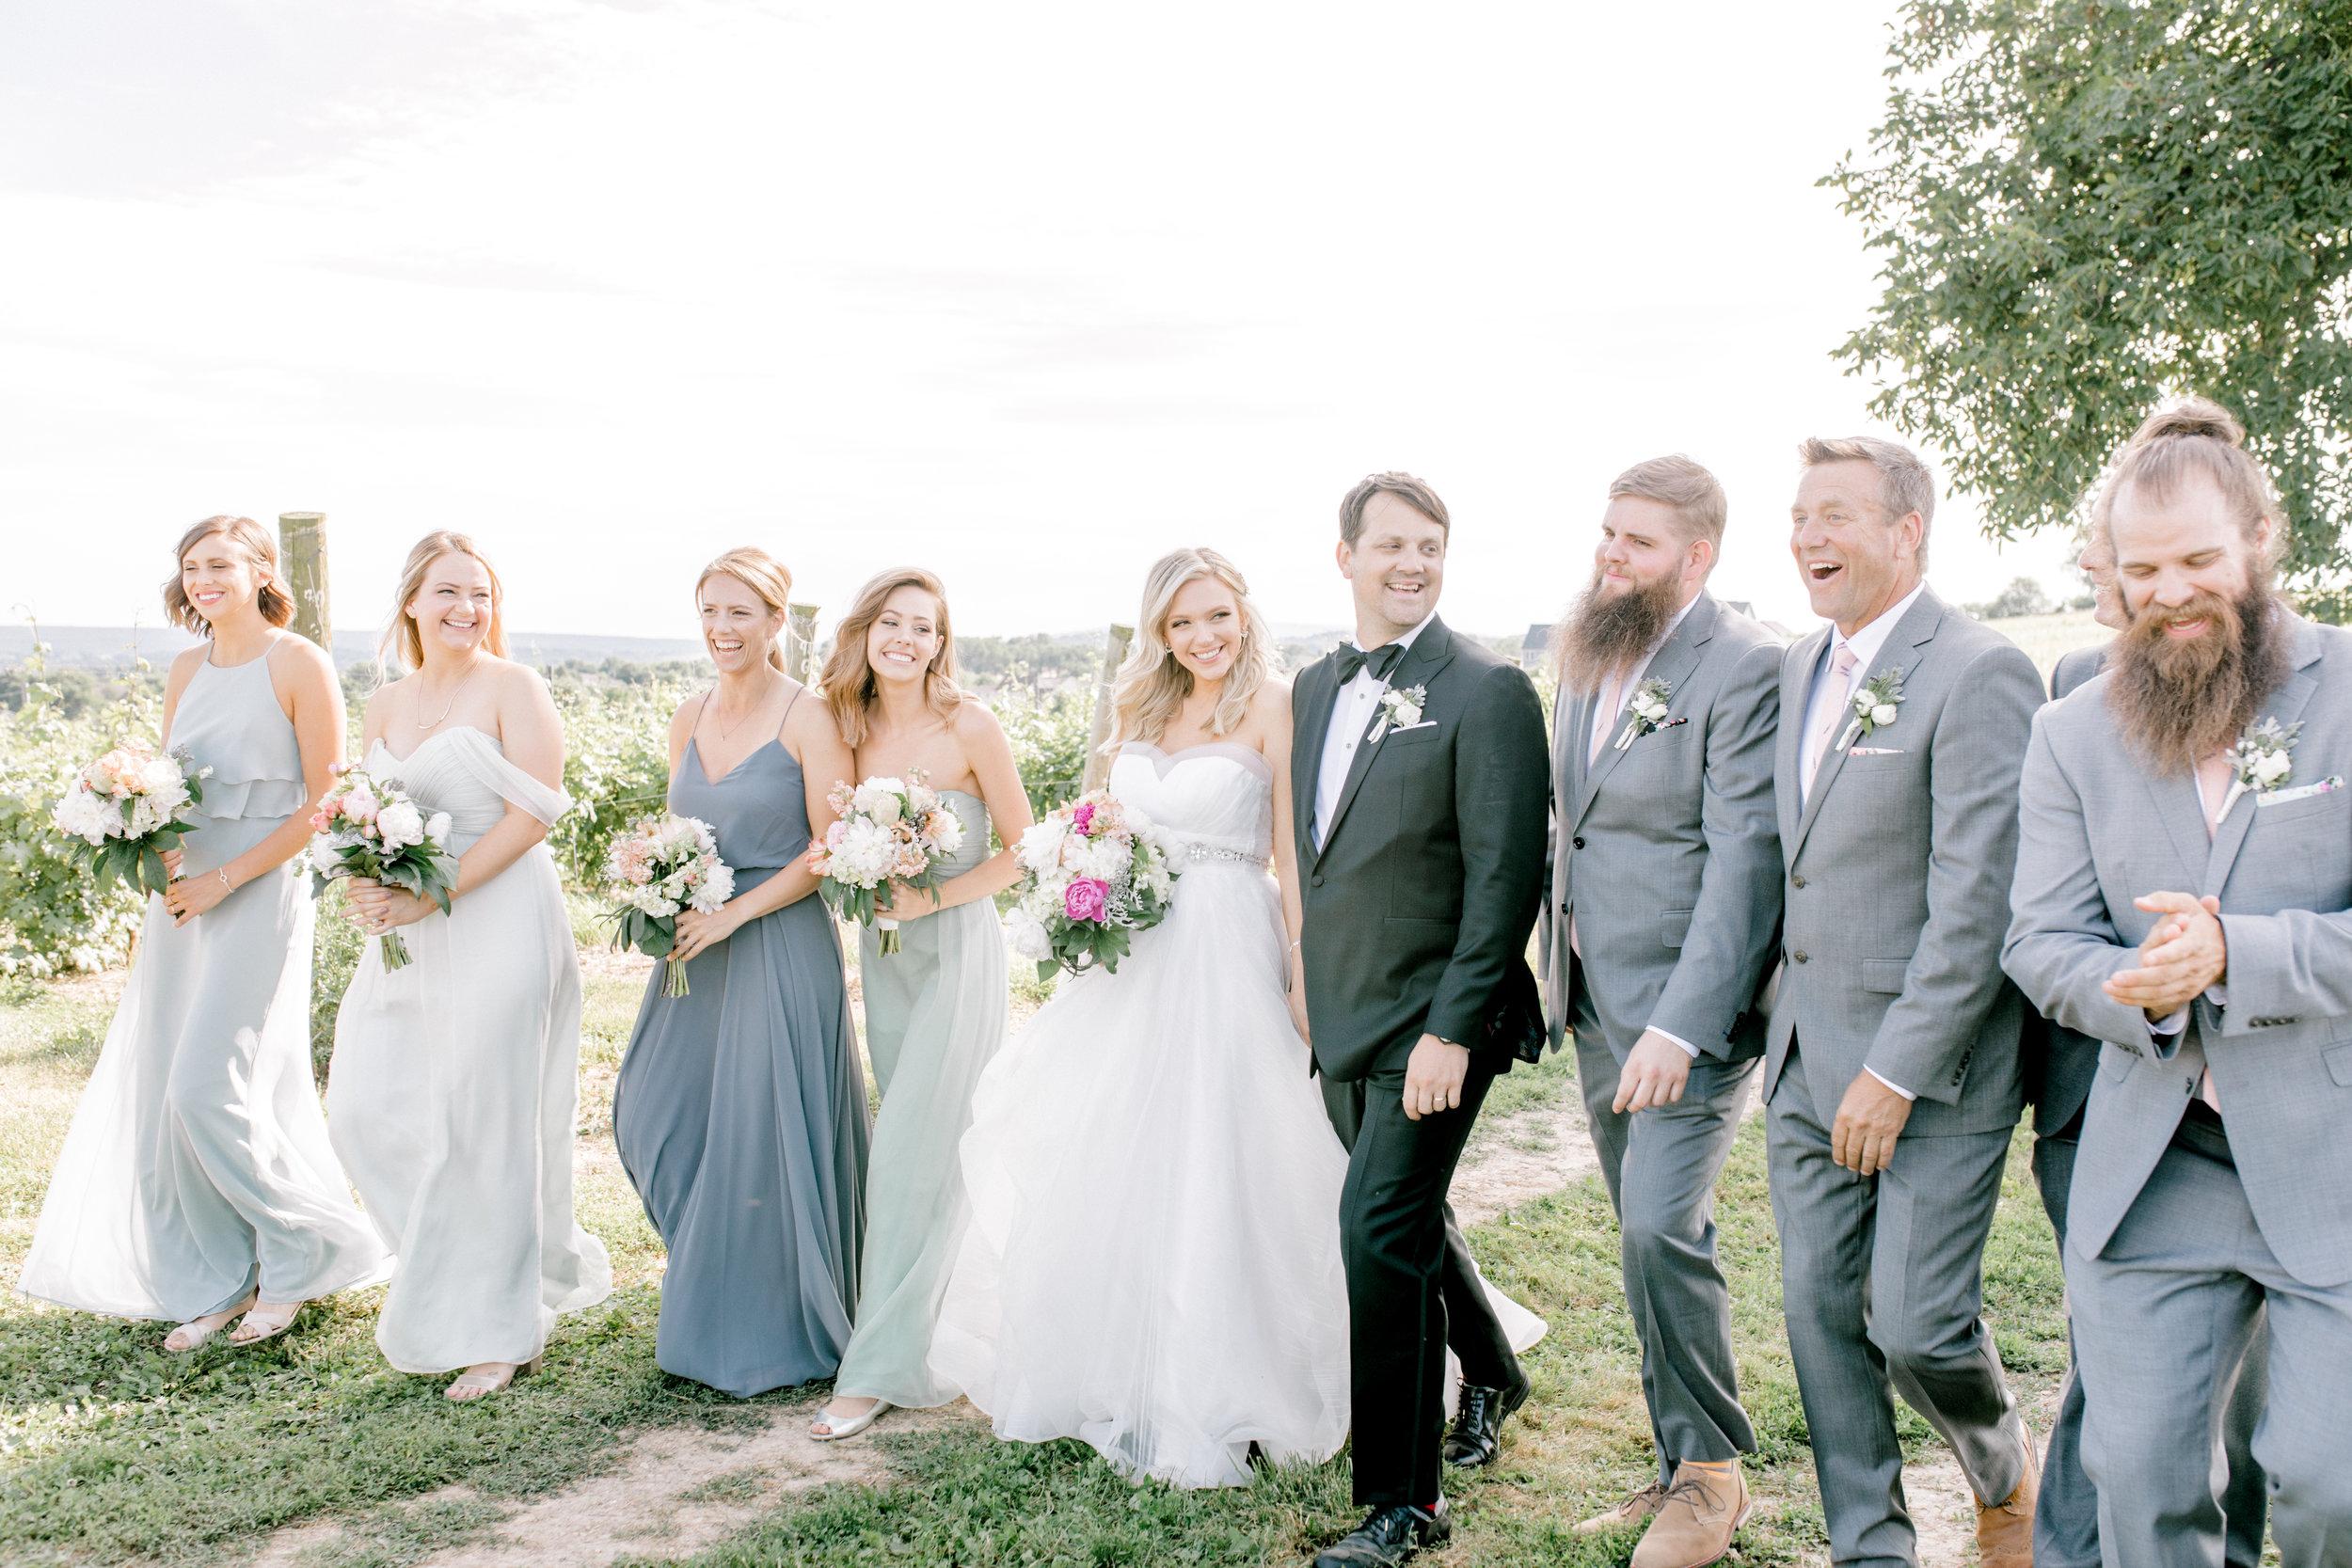 haley-richter-photography-summer-winery-vinyard-wedding-bridal-party-inspiration-gray-green-slate-bridesmaids-groomsmen-suits-dresses